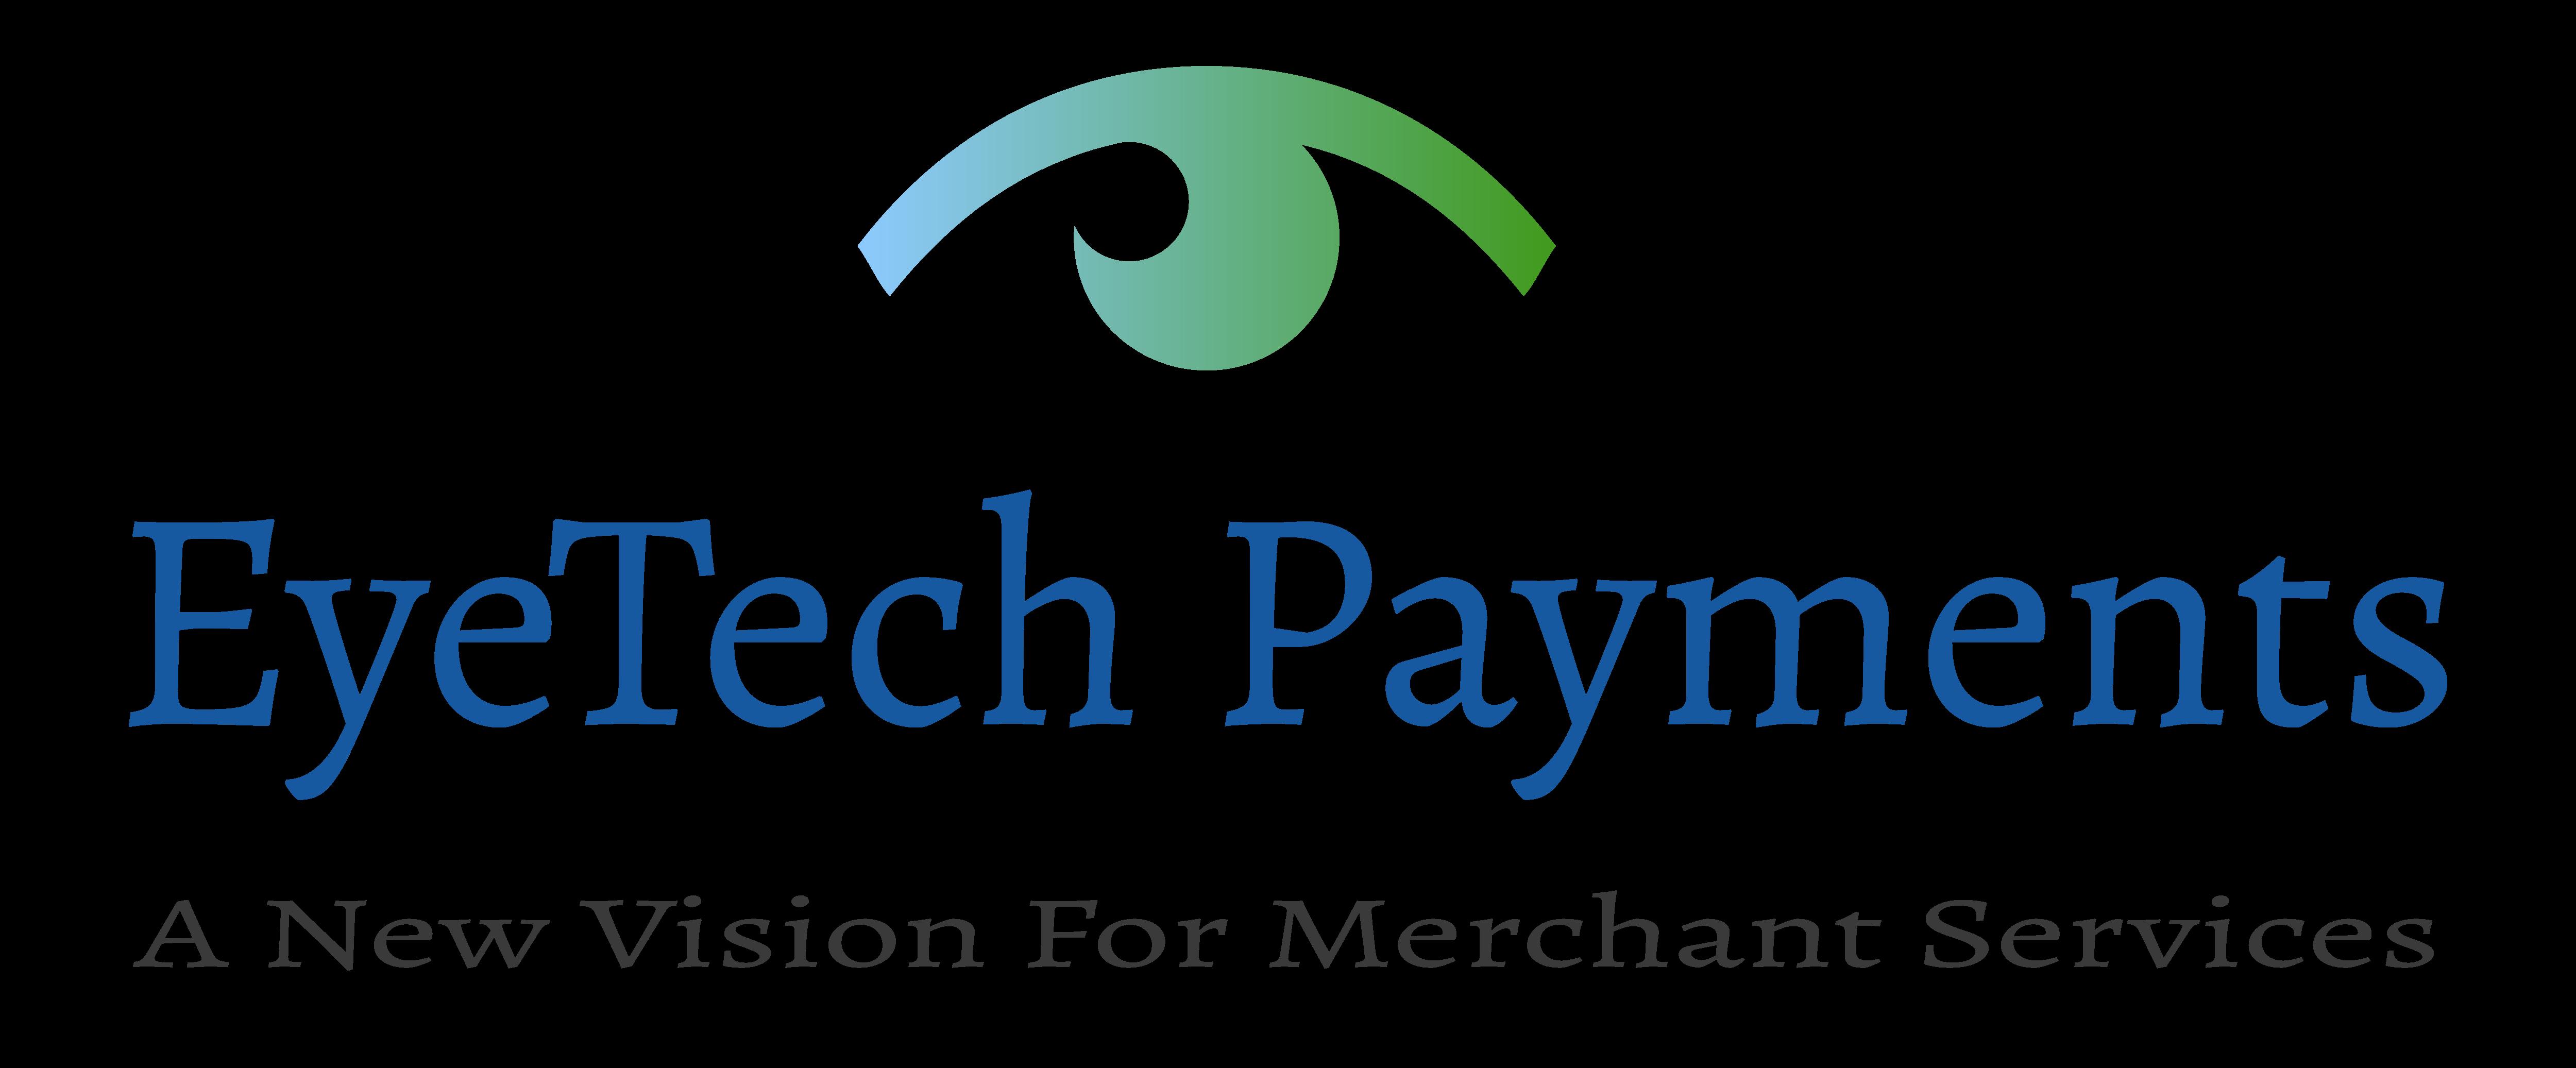 EyeTech Payments